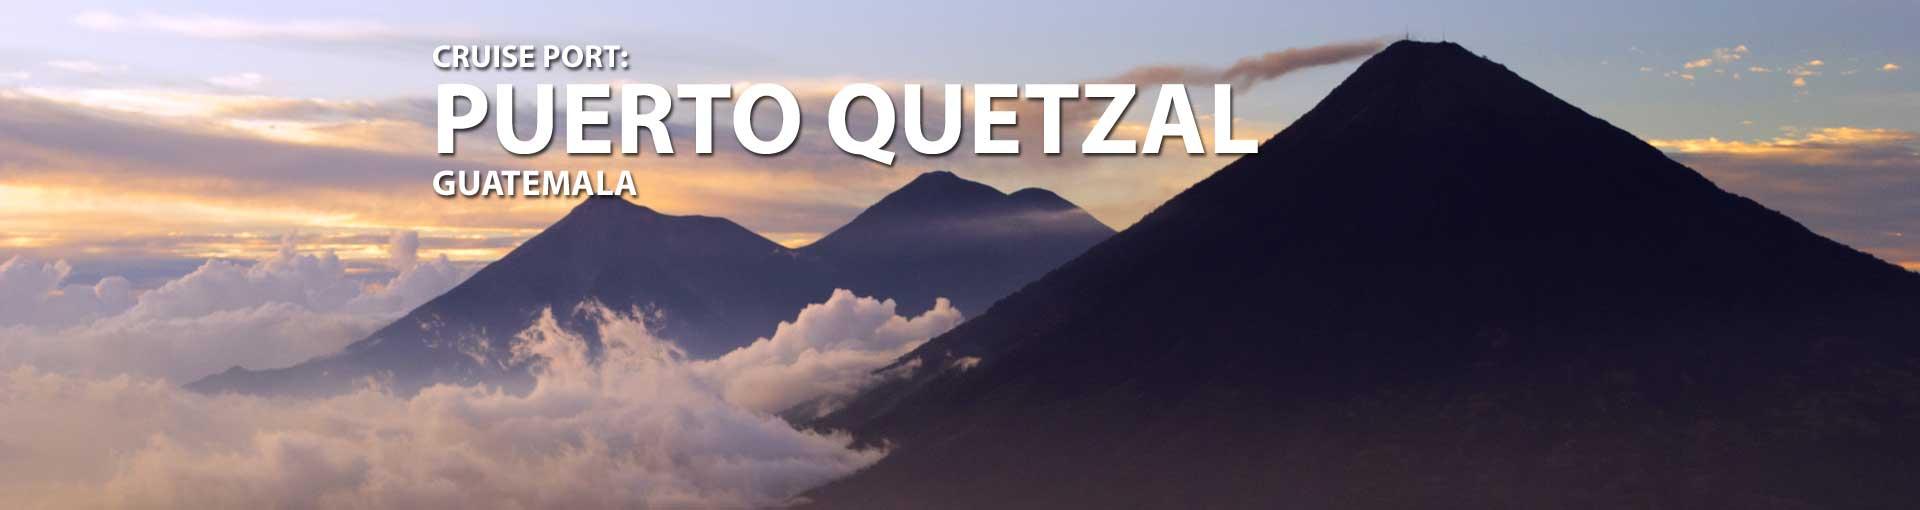 Cruises to Puerto Quetzal, Guatemala